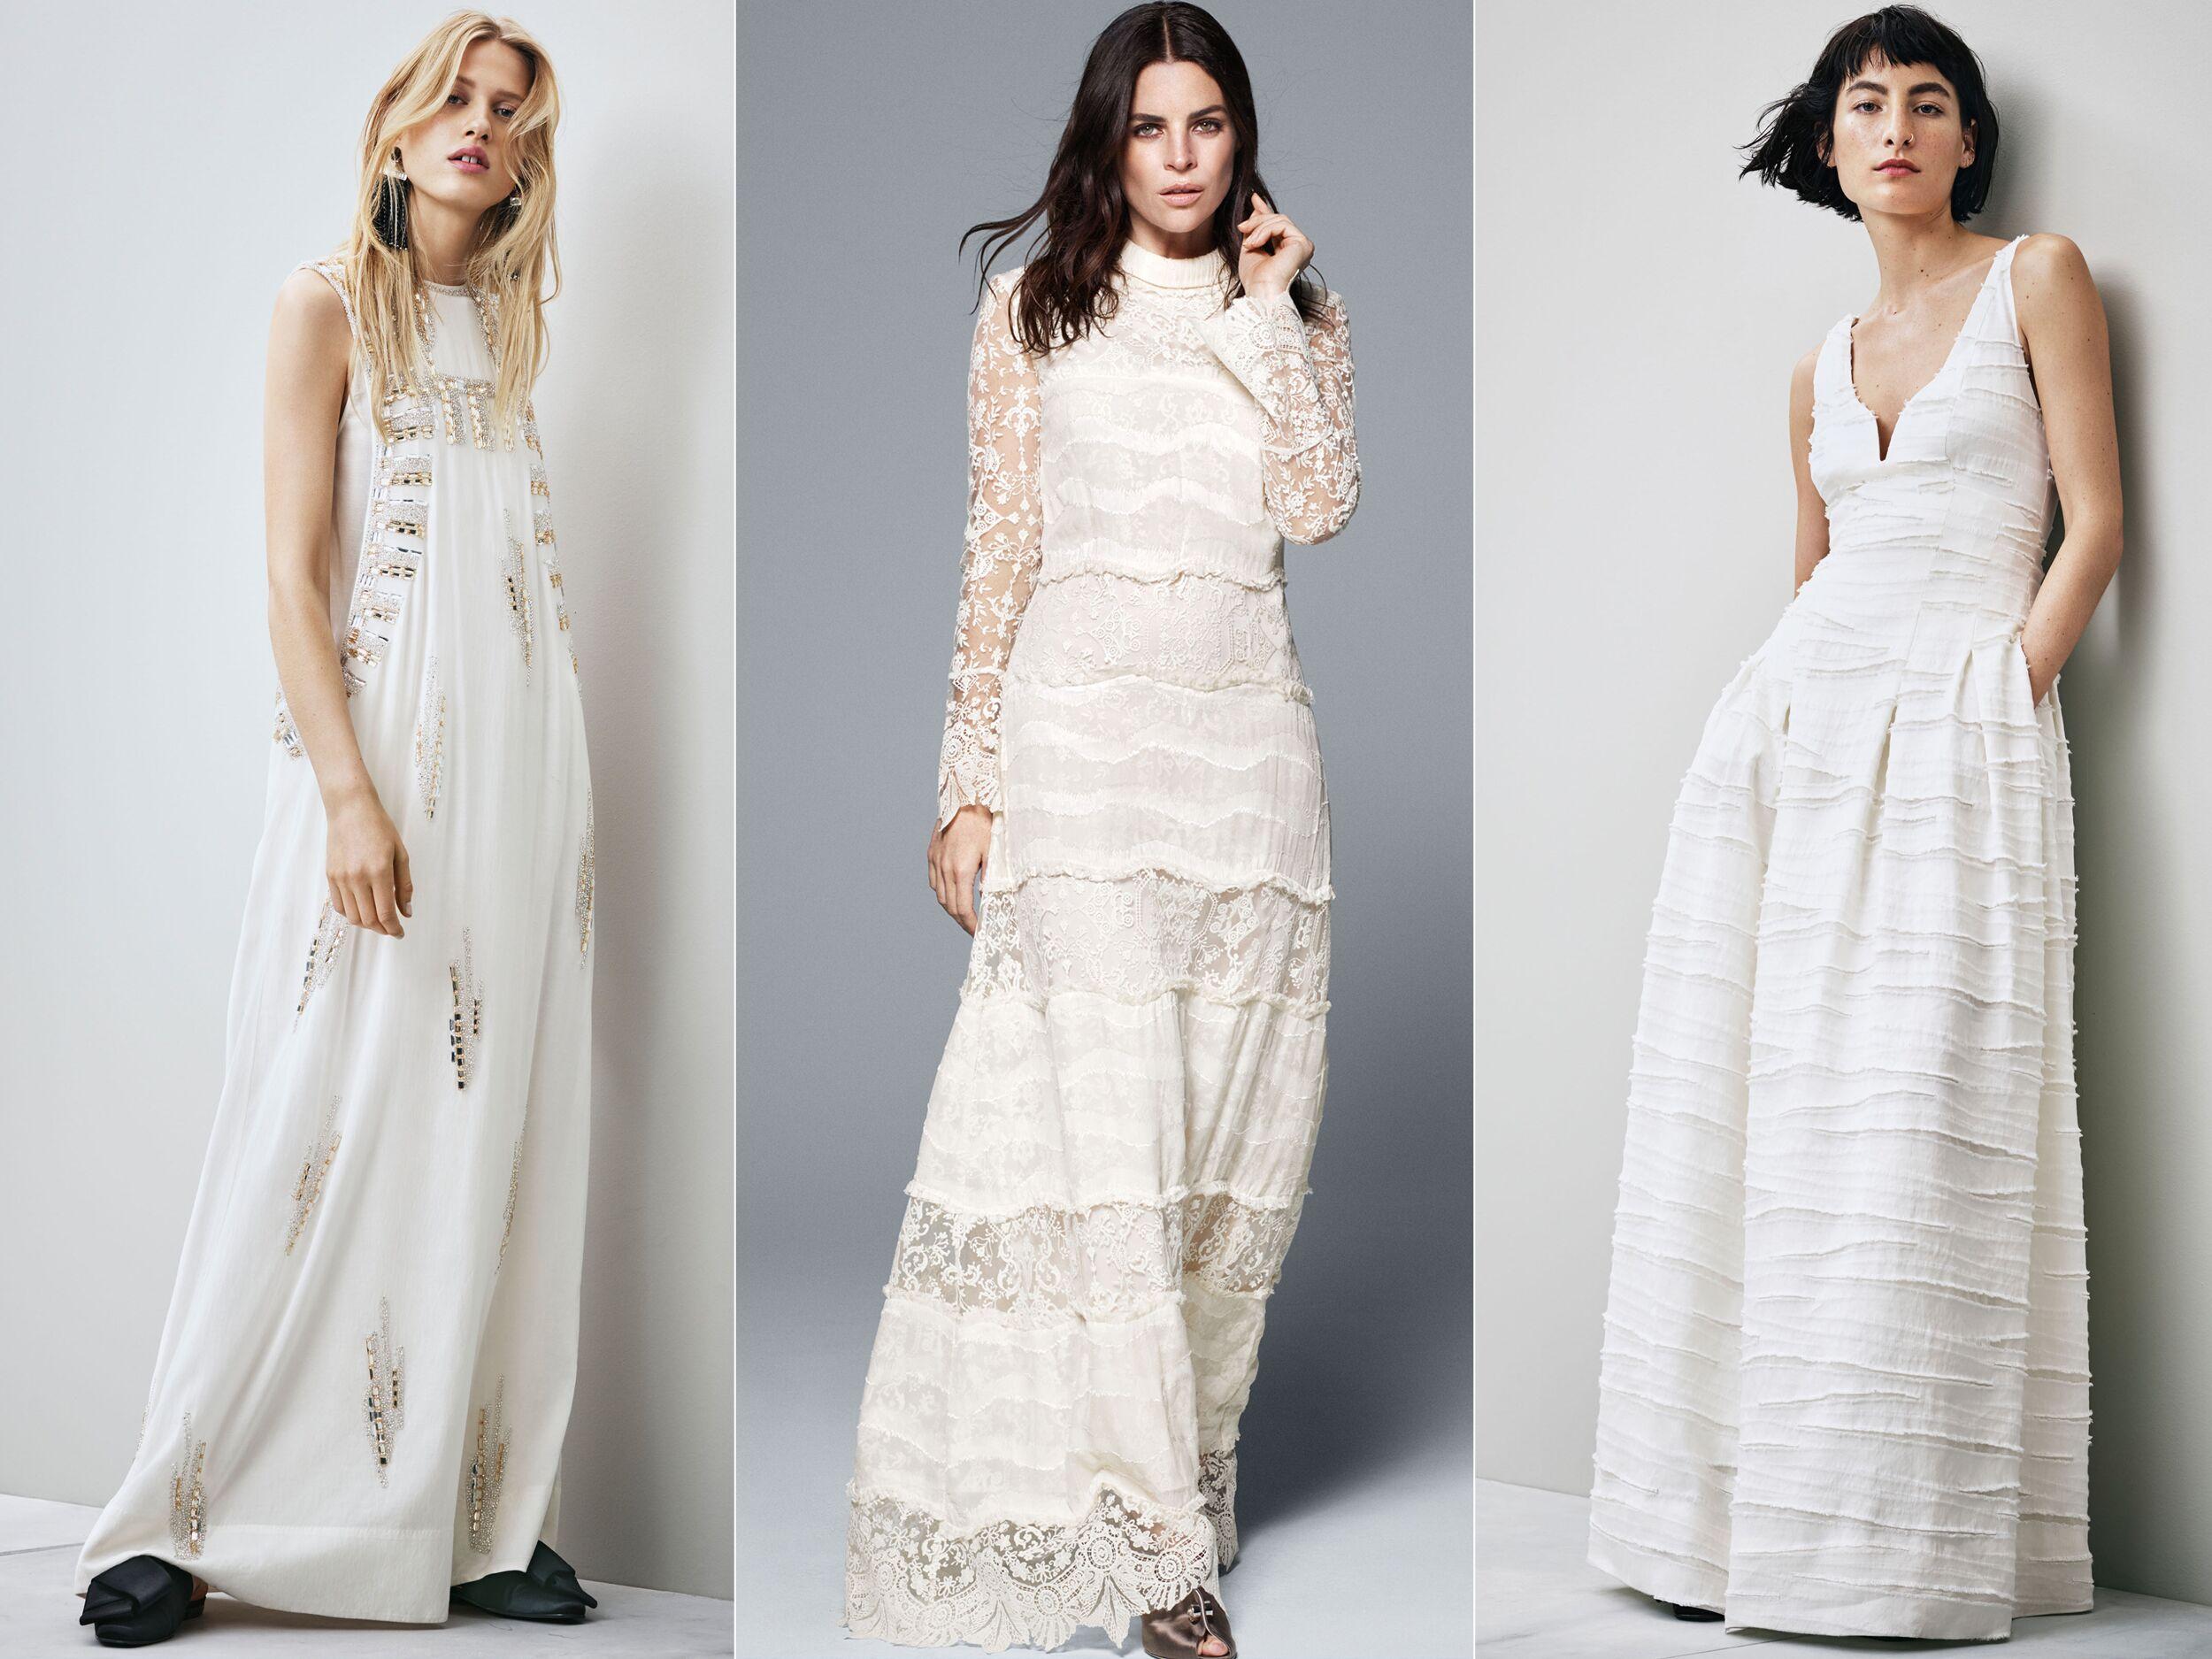 327993225d2 H M Launches Eco-Conscious Wedding Dresses